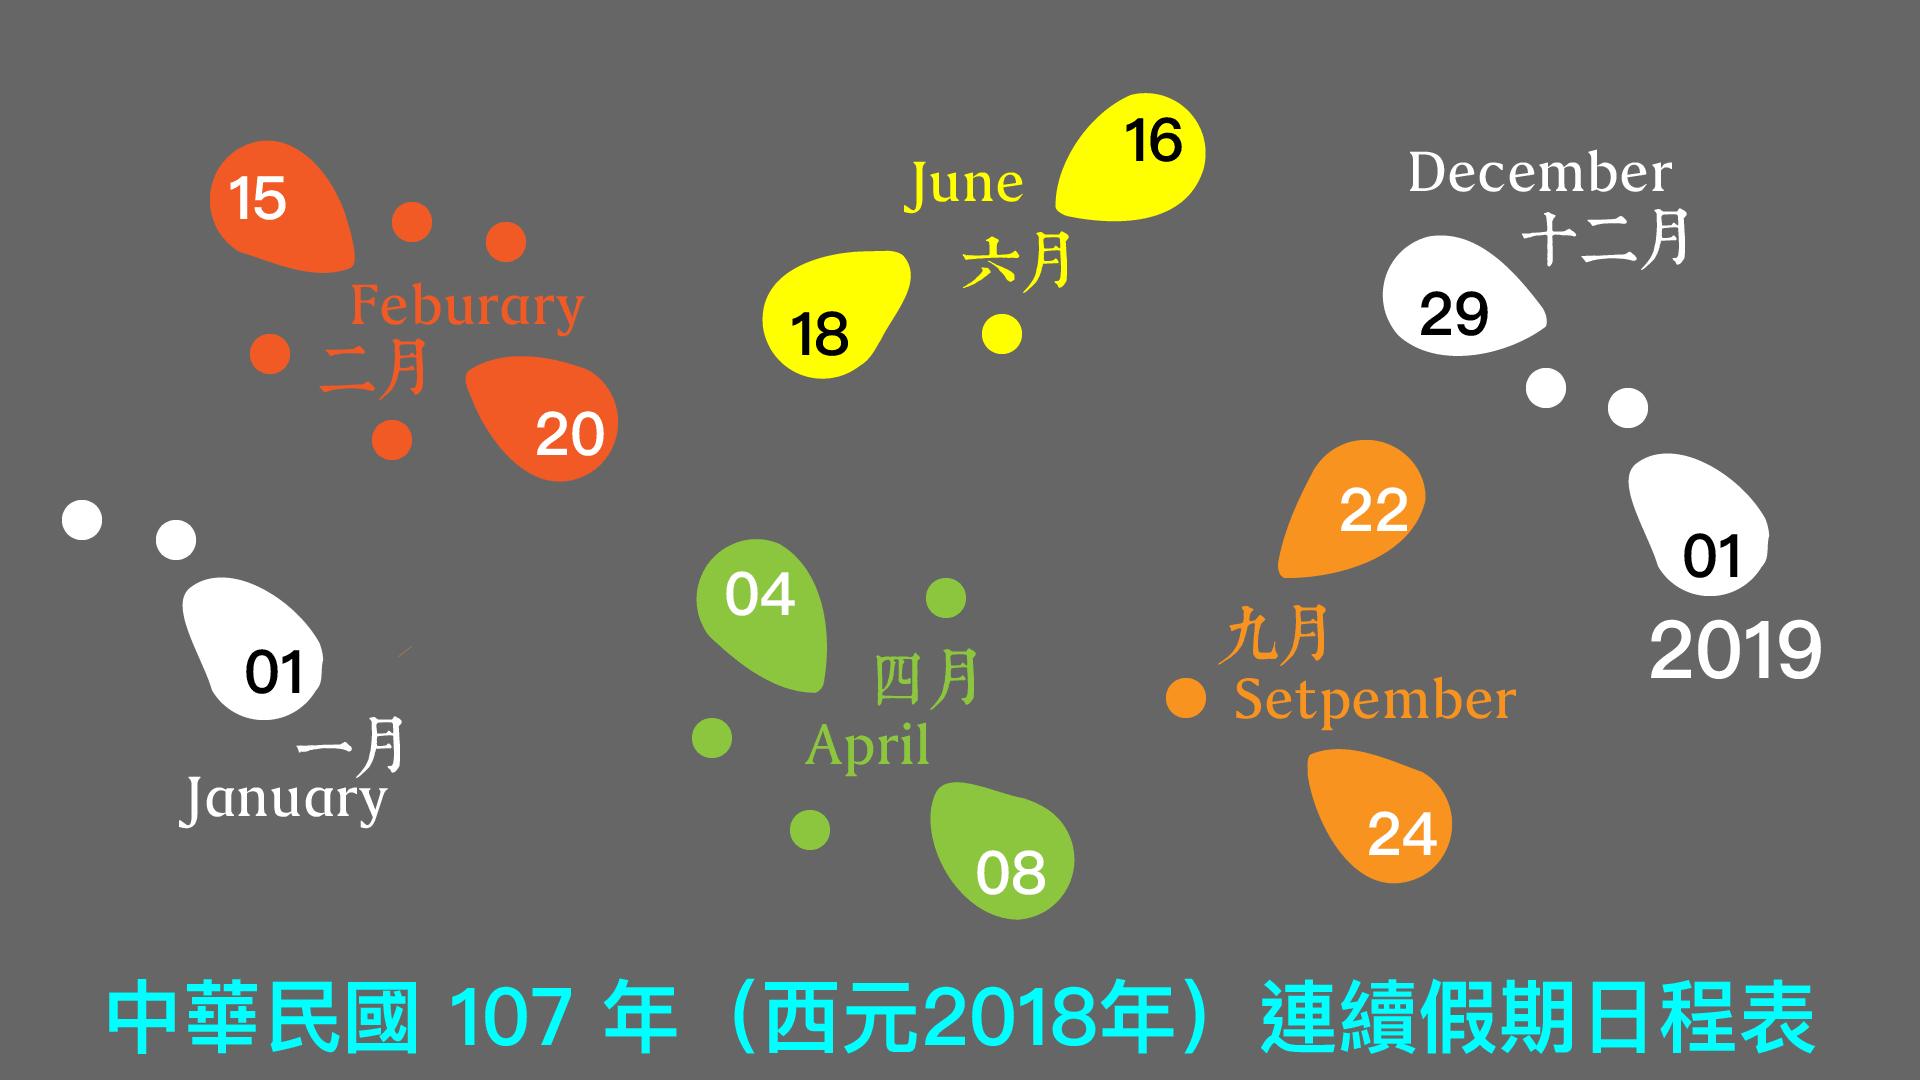 2018 continuous holidays of Taiwan Penghu Kinmen Matsu ROC 民國107年(2018)台澎金馬連續假期行事曆(農曆春節、清明、端午與中秋連續假日)